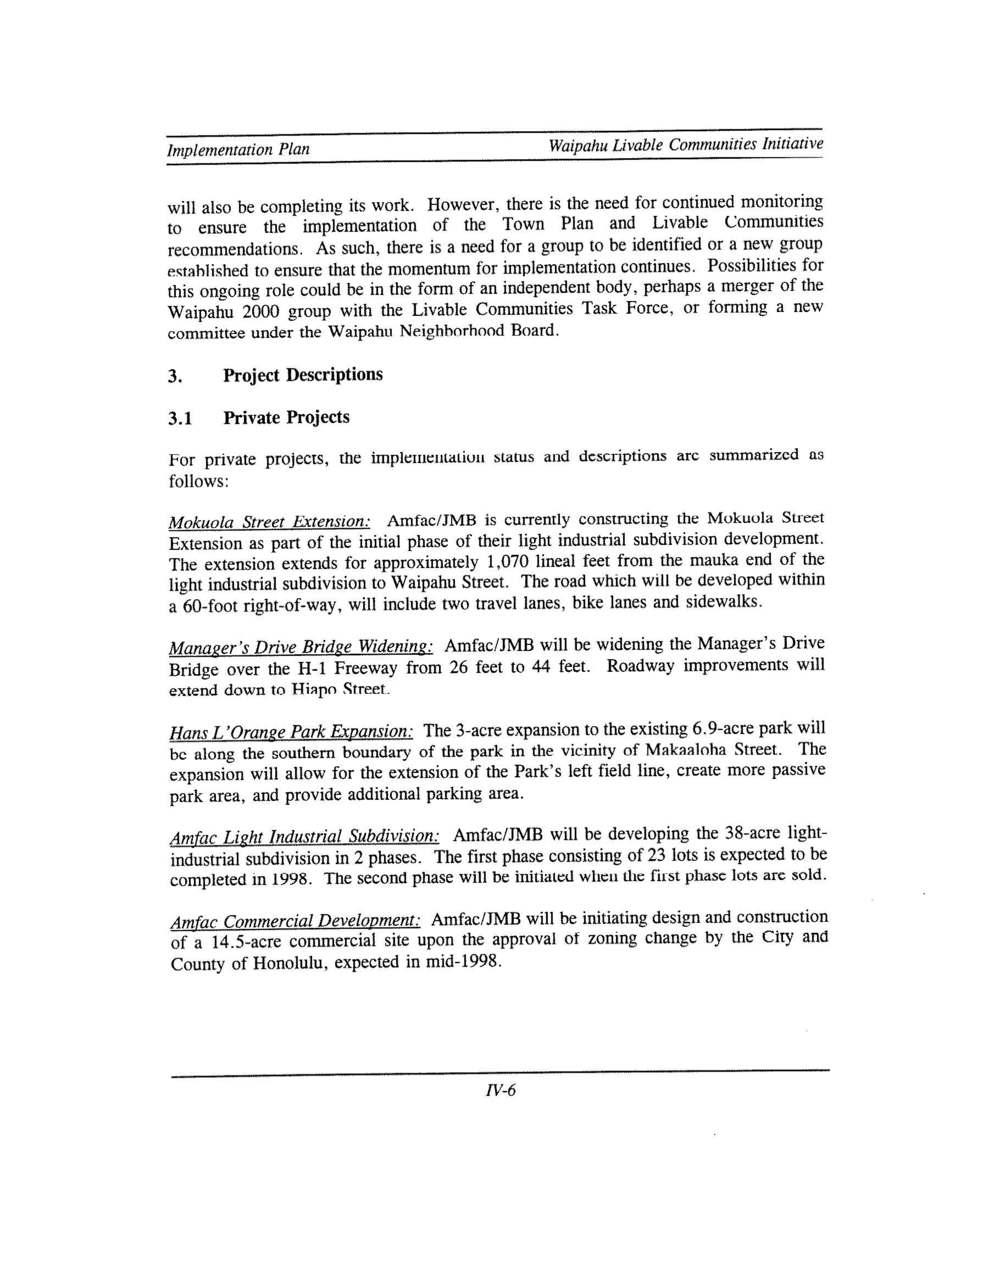 160531_WaipahuLivableCommunities(1998)_Page_131.jpg